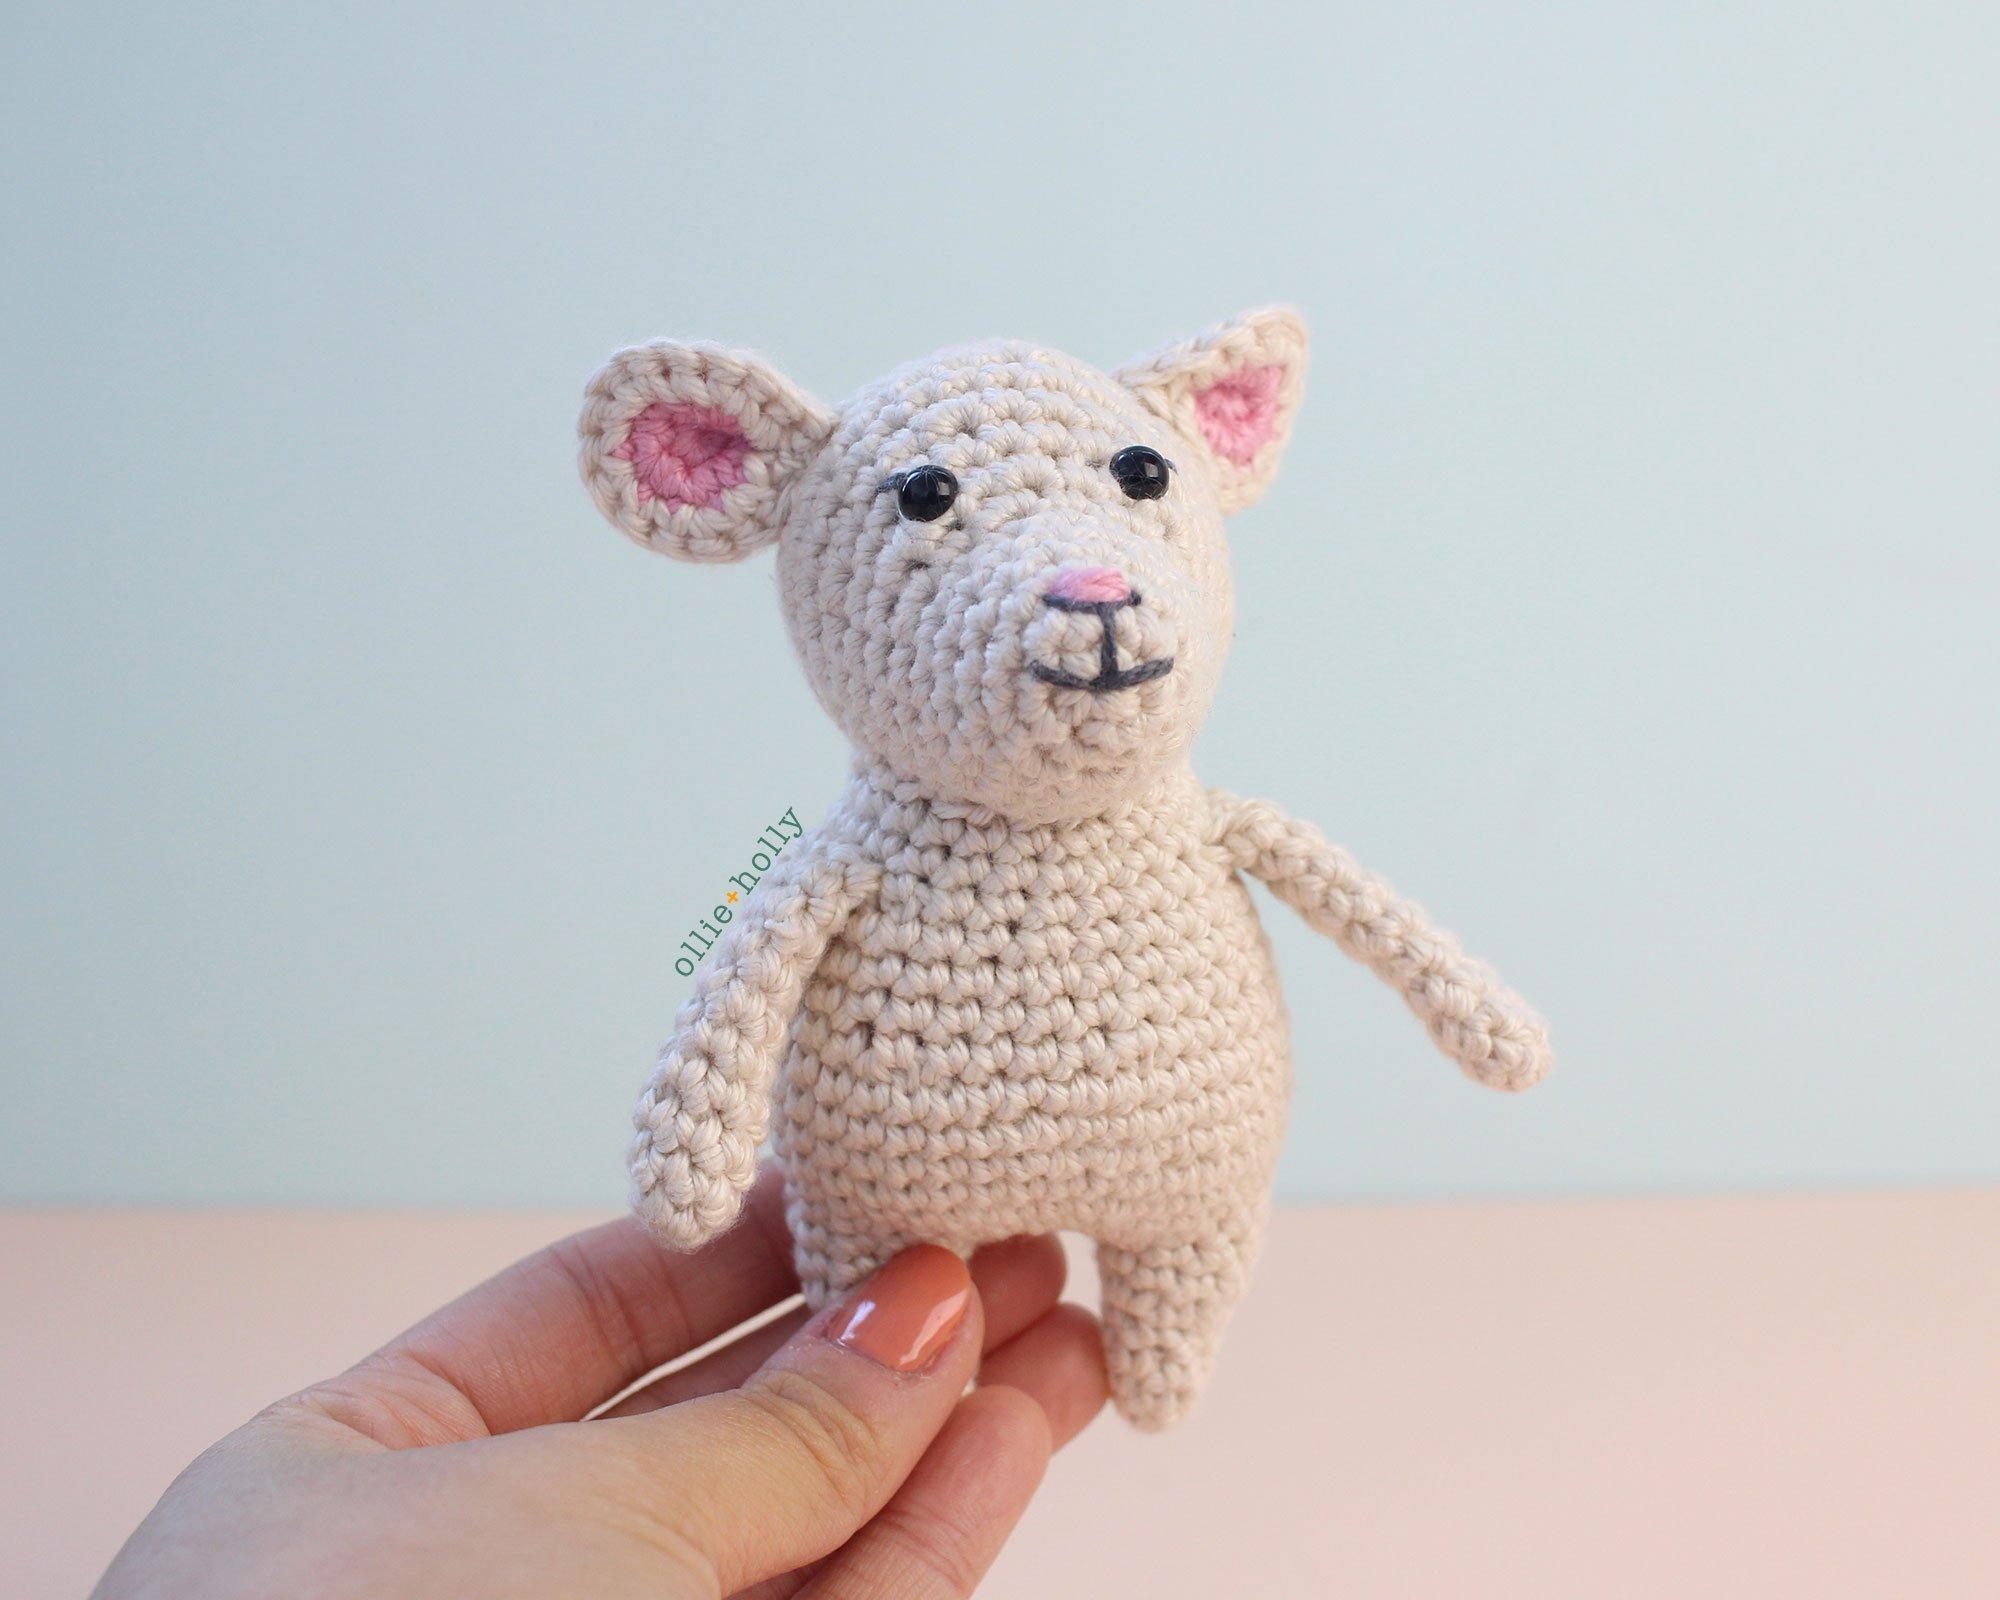 White Mouse Free Amigurumi Crochet Pattern